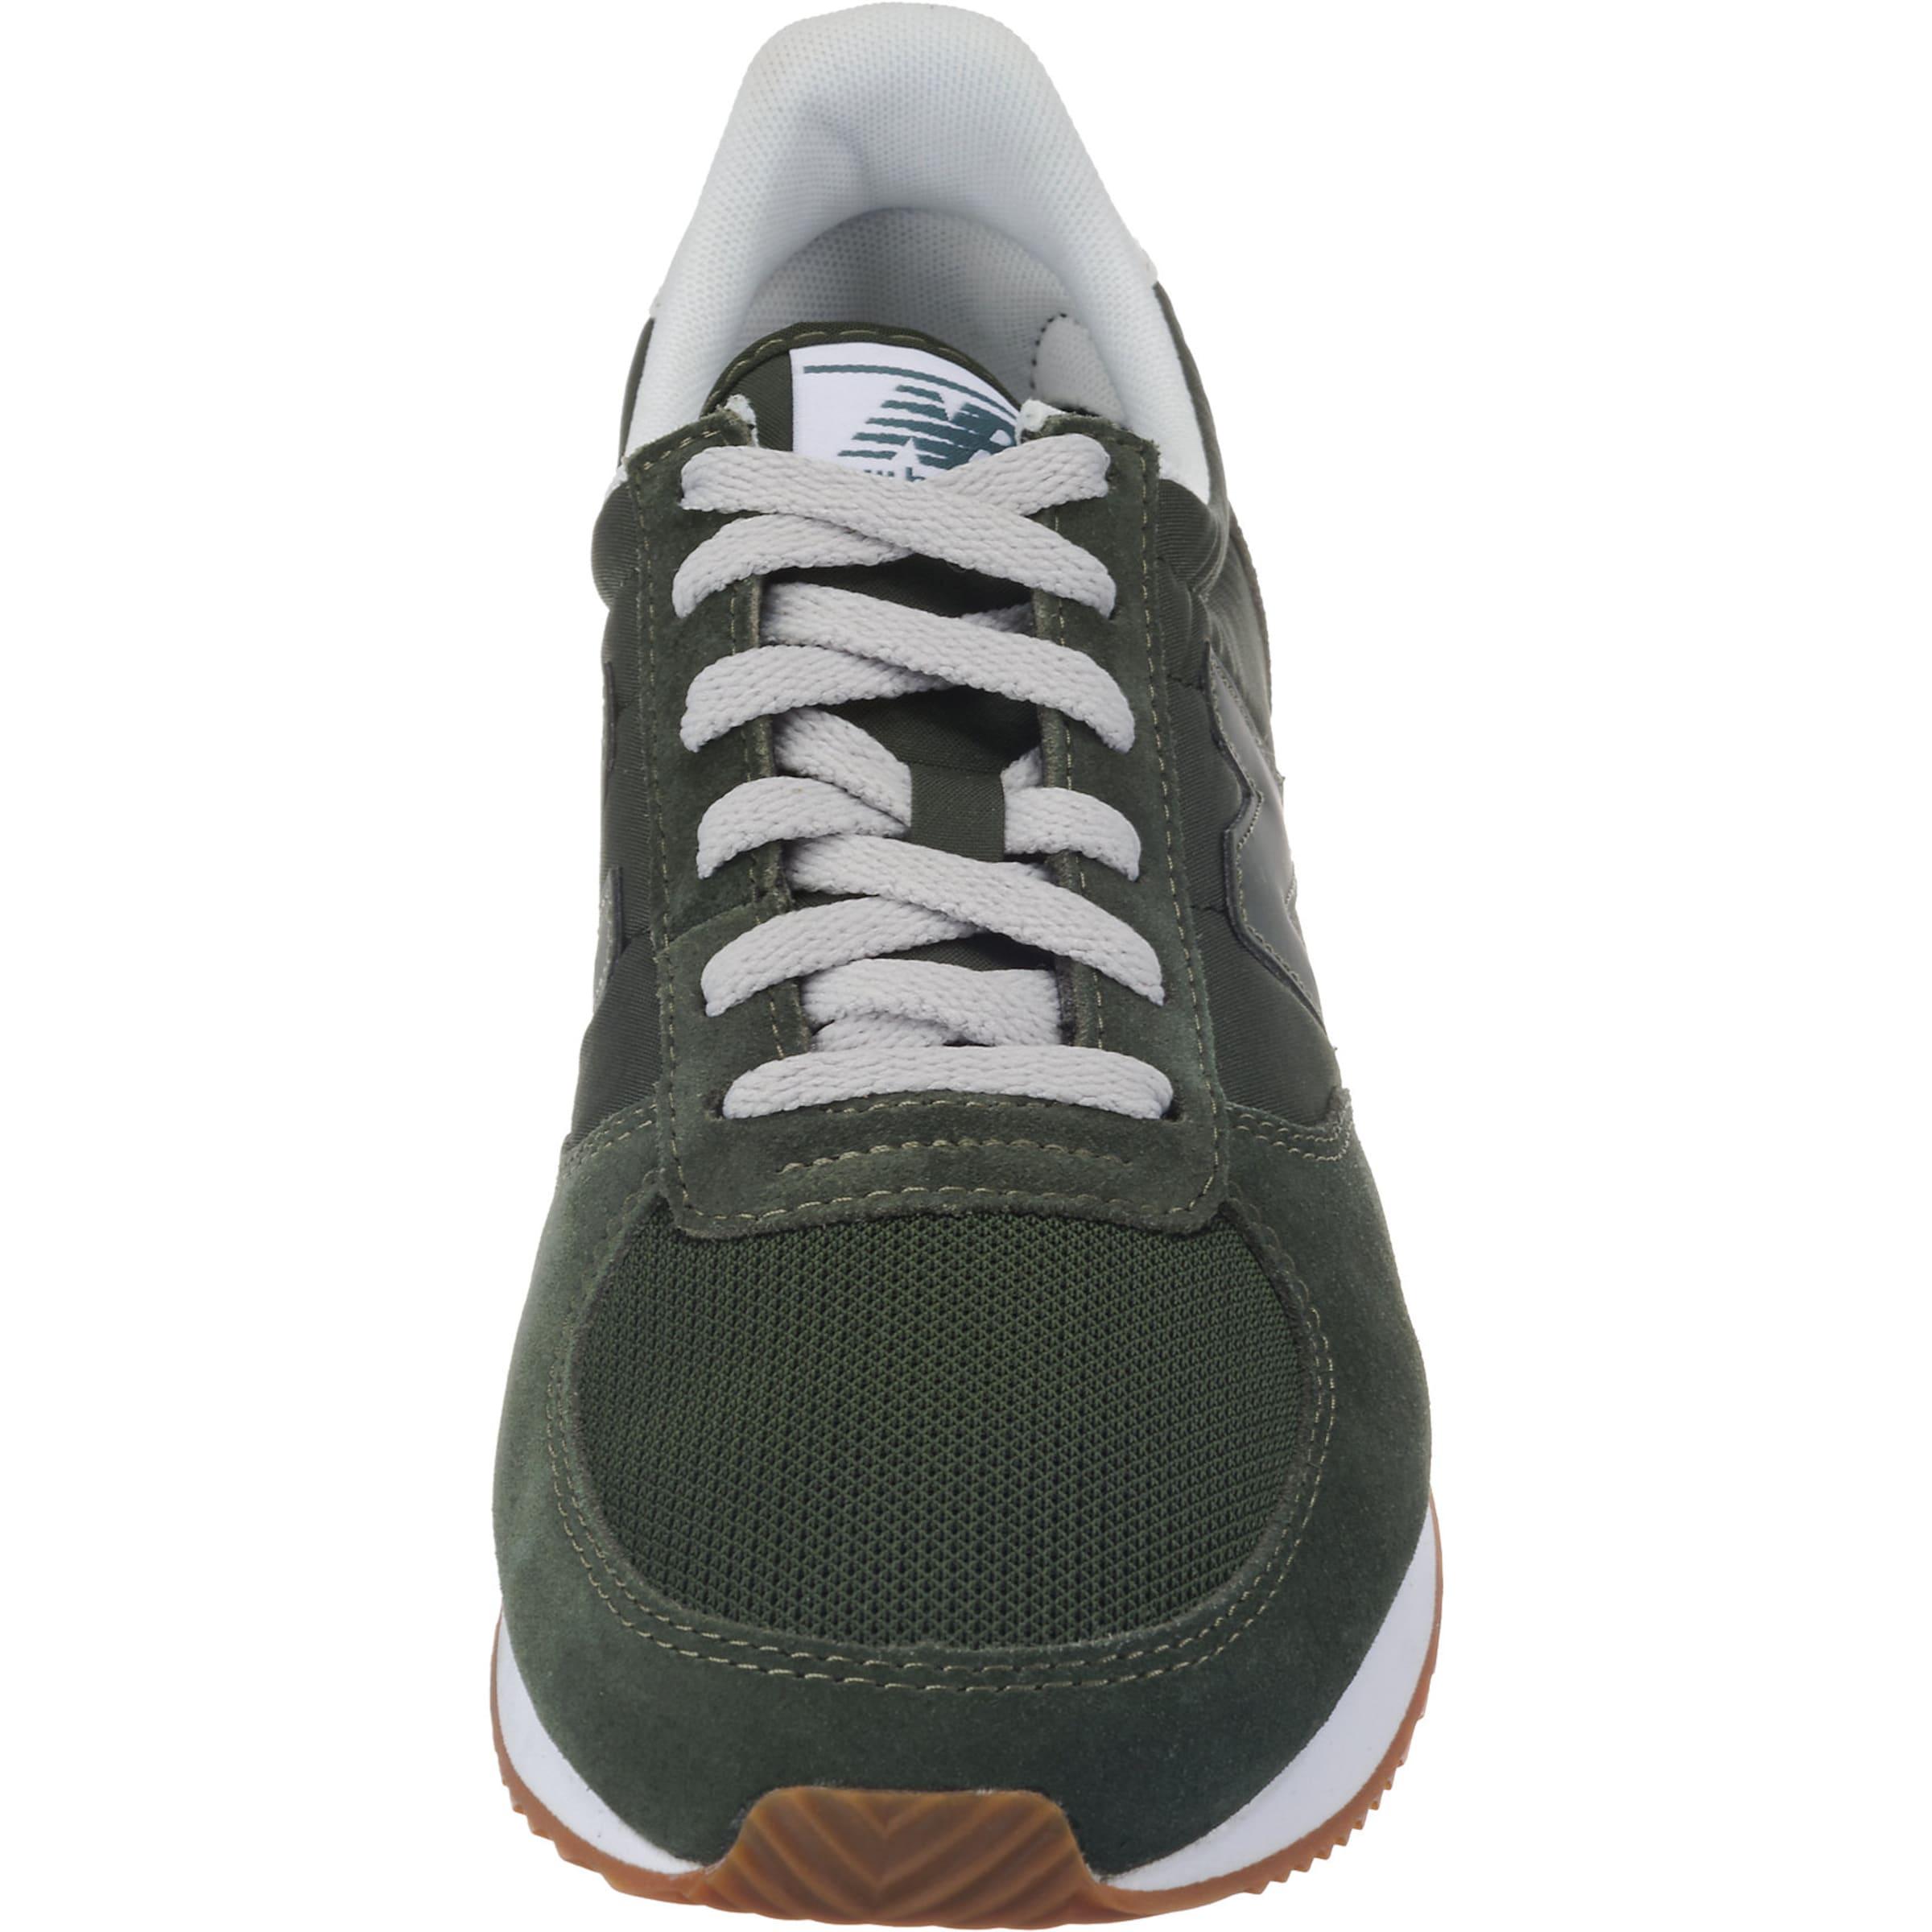 Balance New Grün 'u220' In Sneaker sCxhrtQd